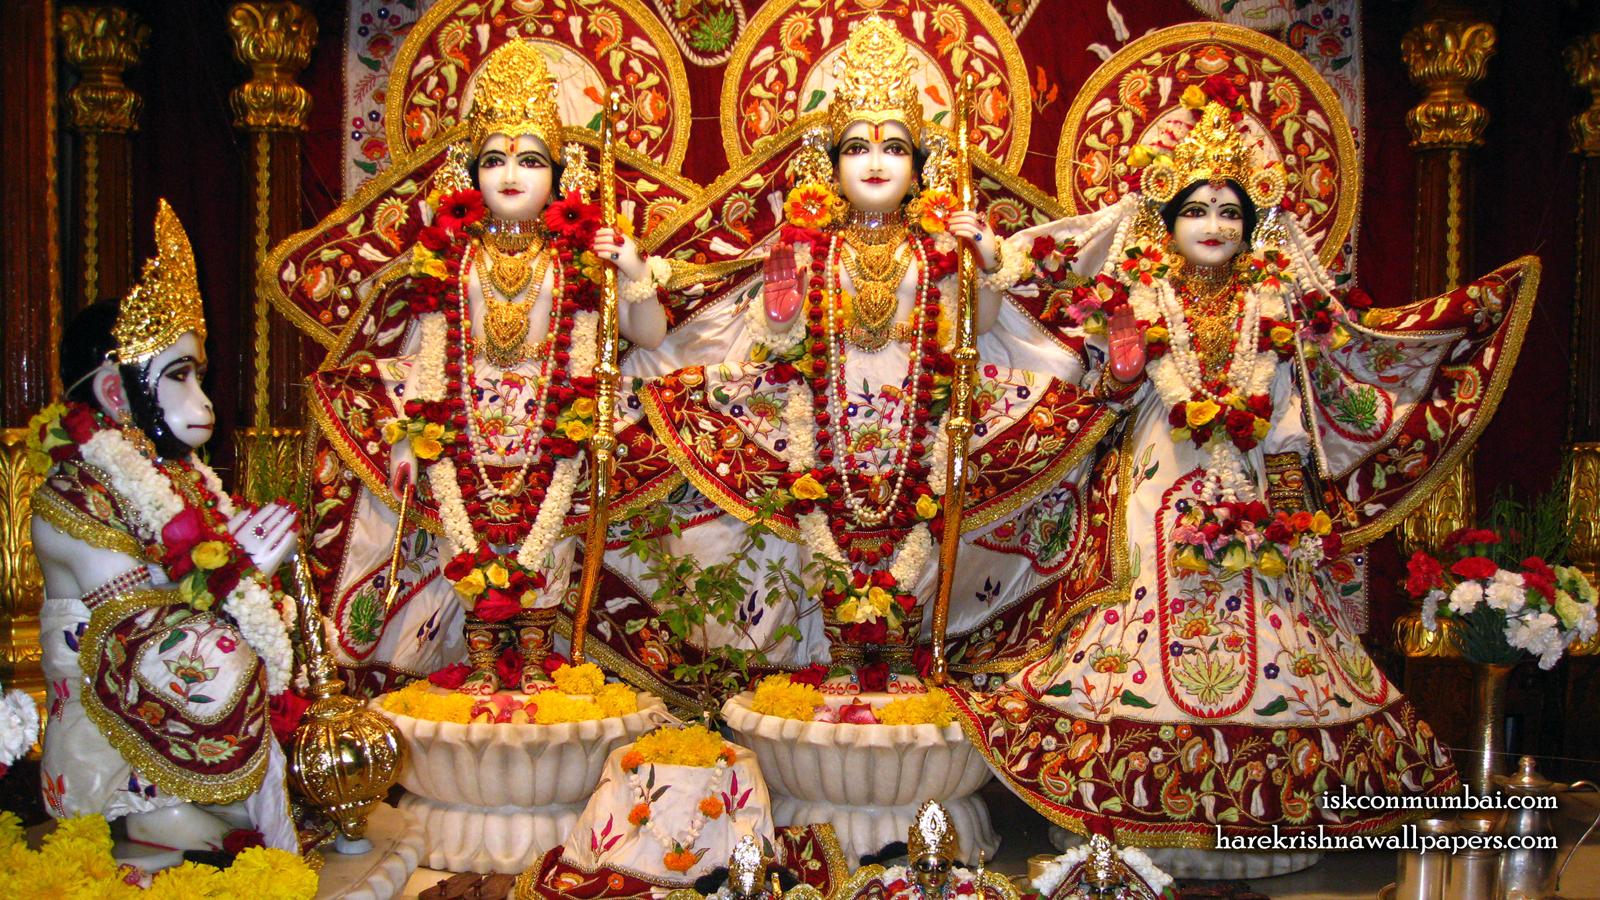 Sri Sri Sita Rama Laxman Hanuman Wallpaper (002) Size 1600x900 Download